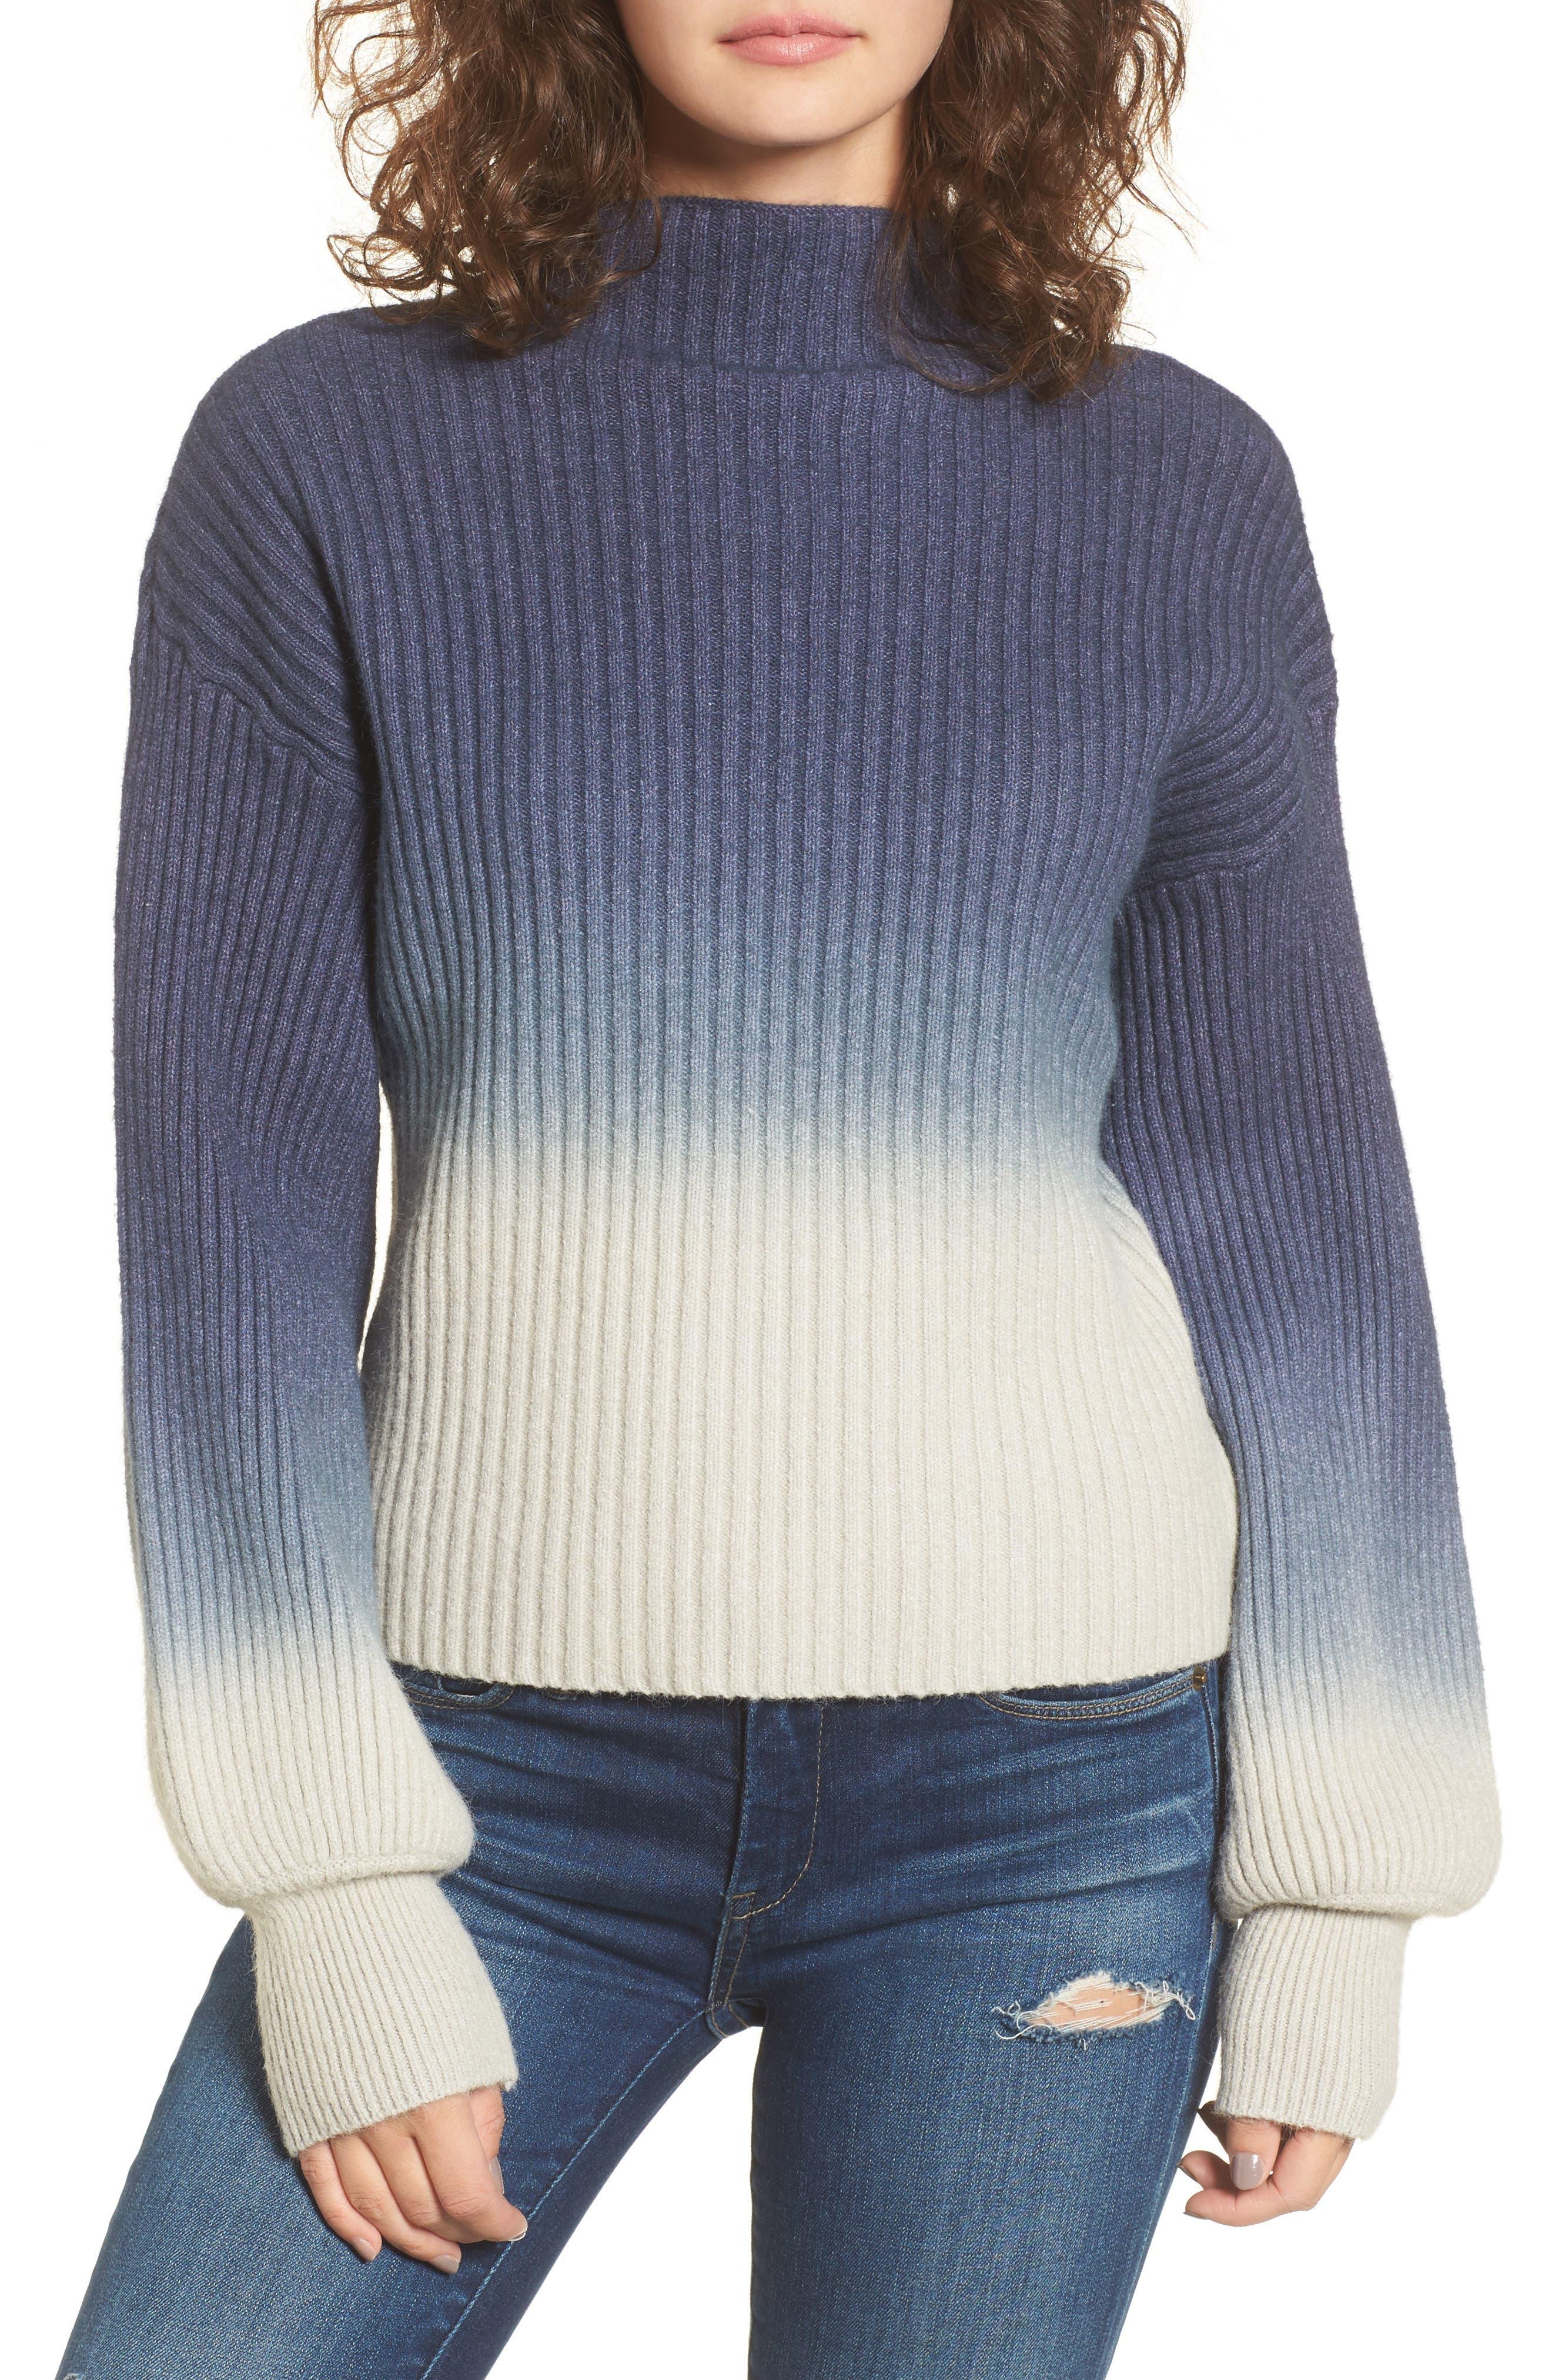 Alternate Image 1 Selected - CODEXMODE Ombré Sweater